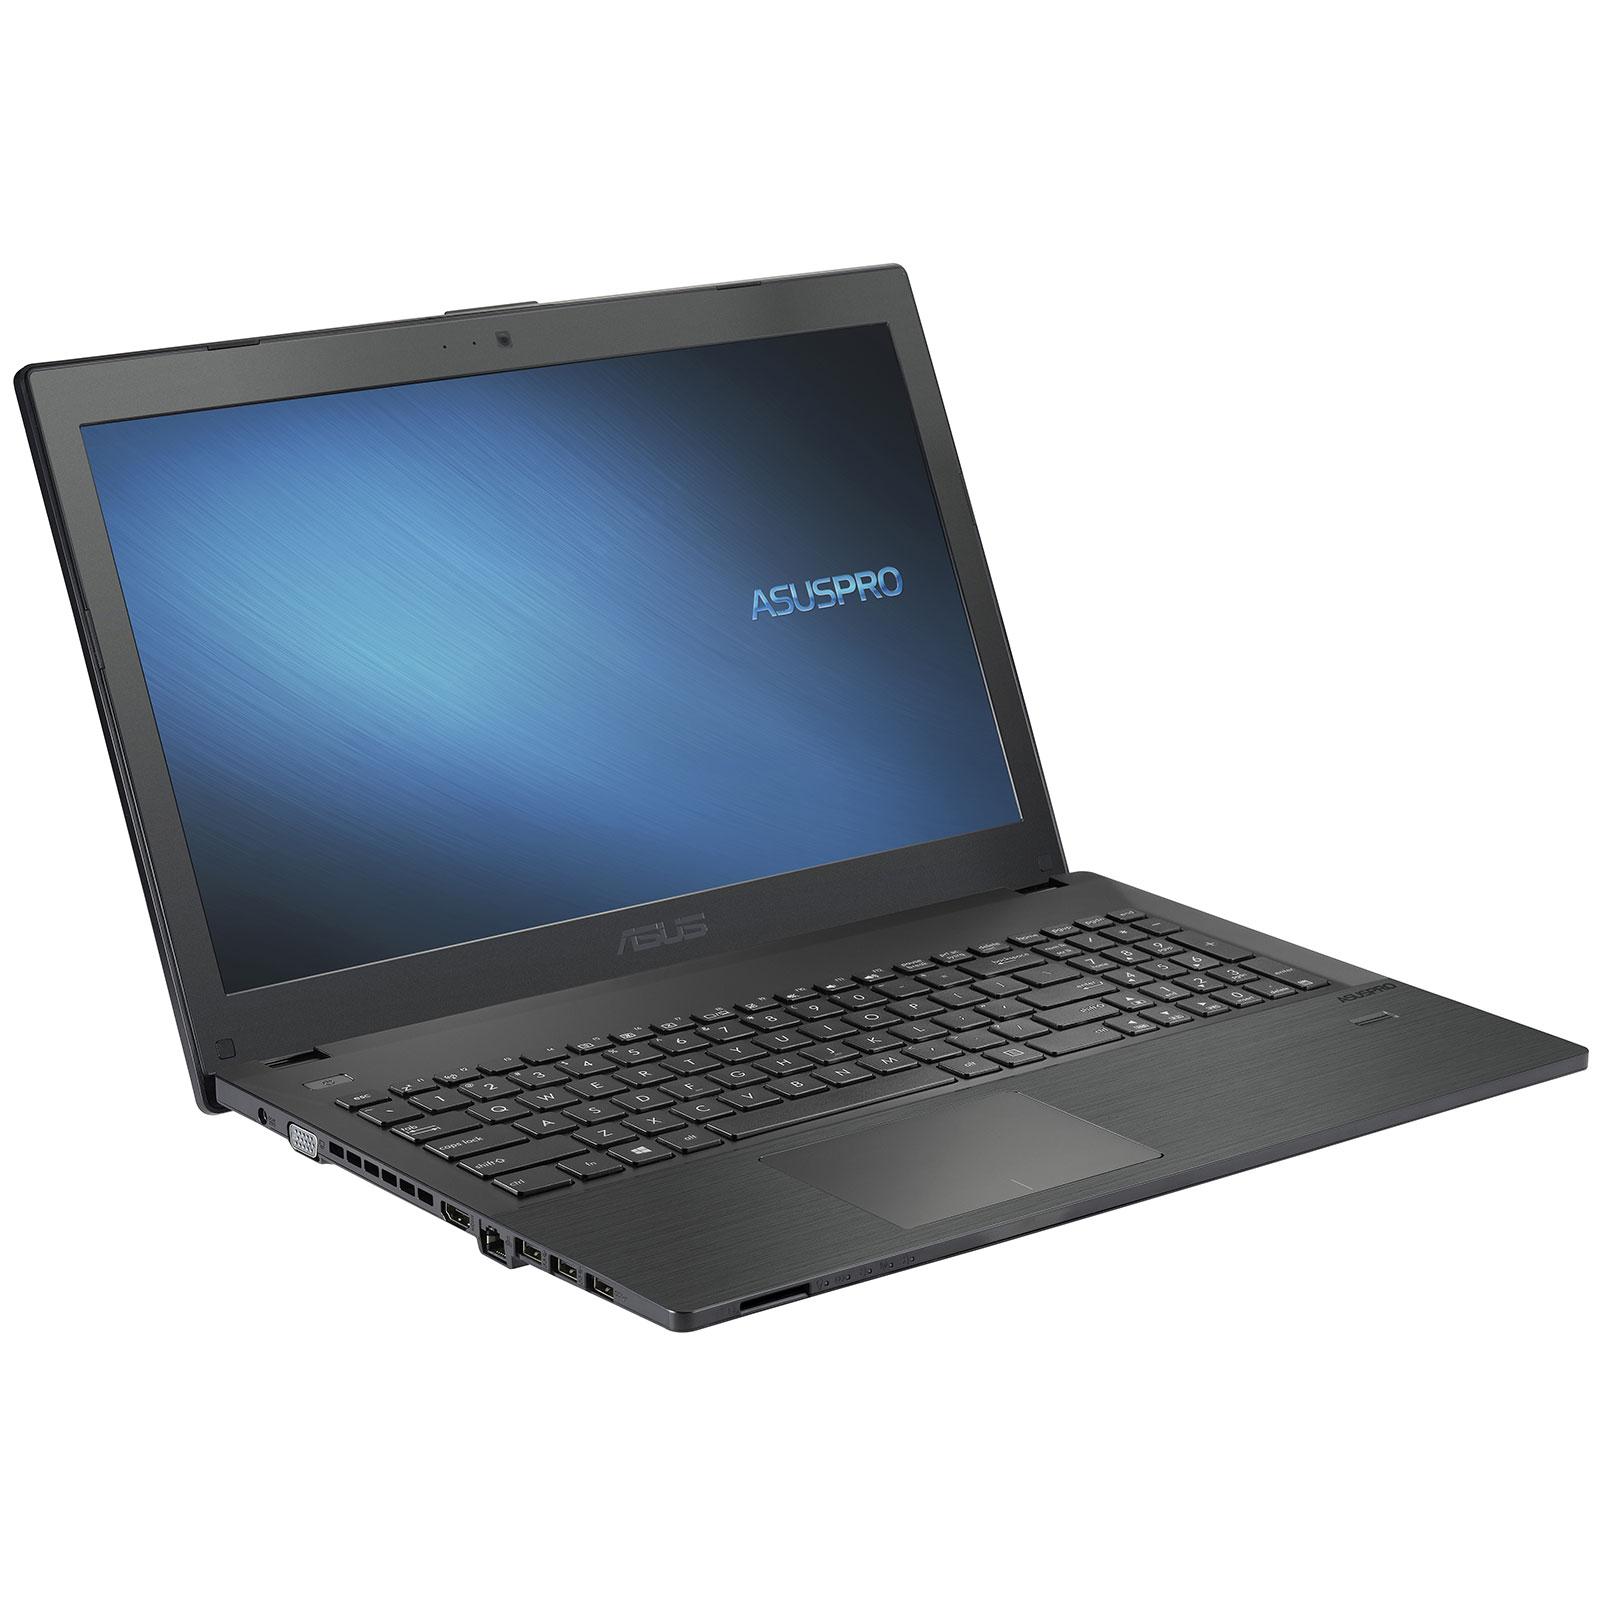 Asus 90NX0051-M13020 - PC portable Asus - Cybertek.fr - 0